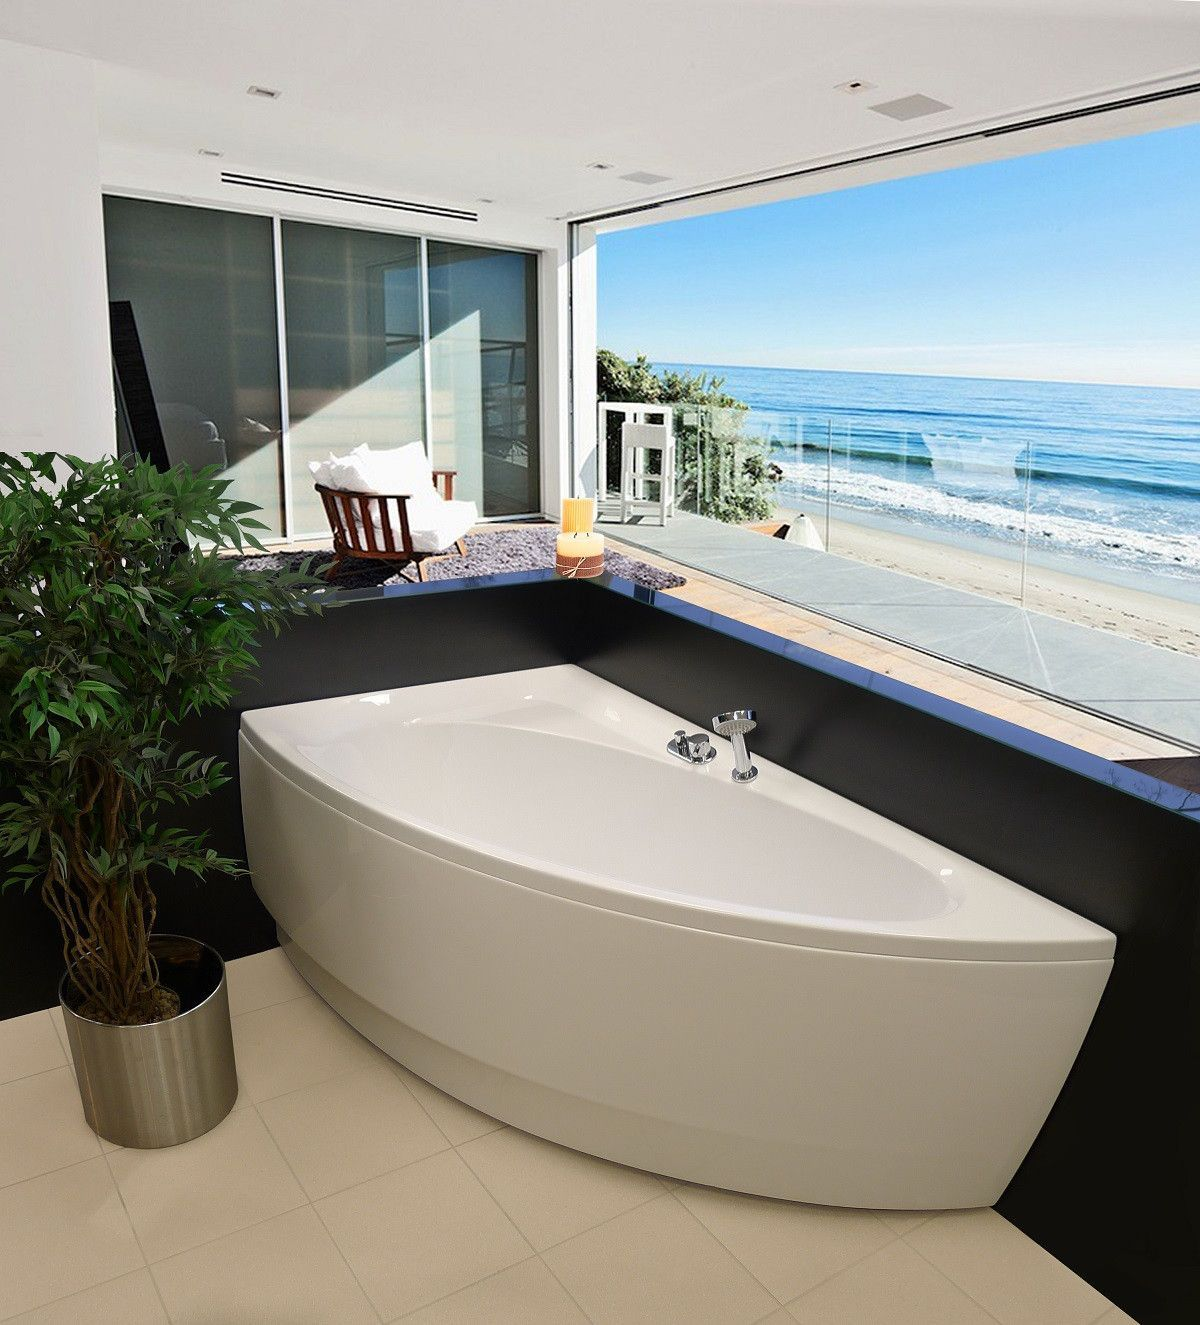 Aquatica Idea Right: Space-Saving Asymmetrical Corner Soaking Tub ...